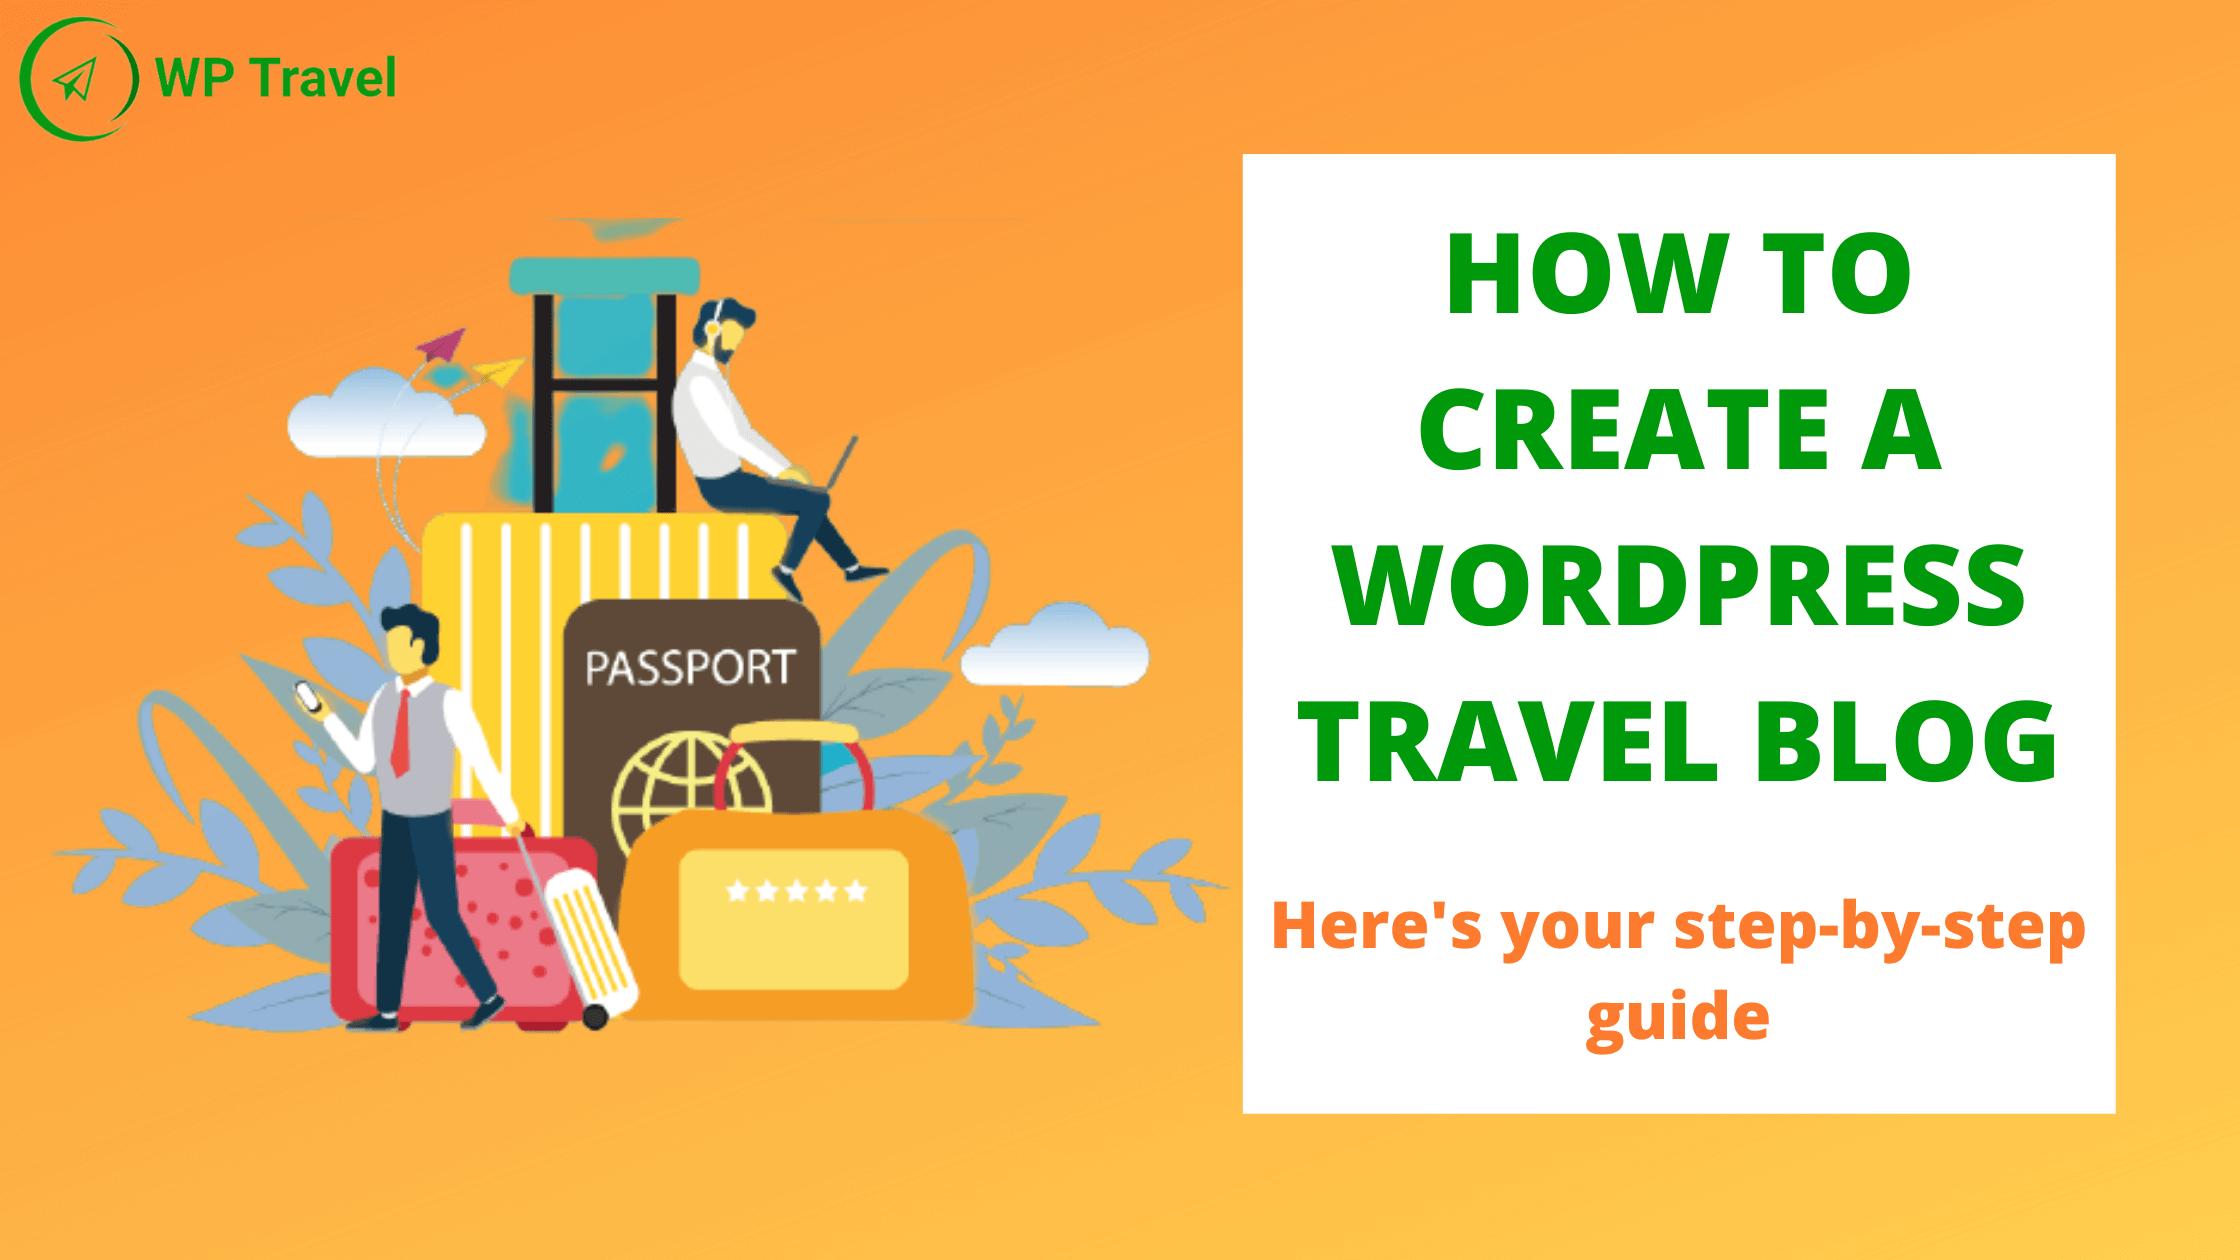 How to create a WordPress travel blog